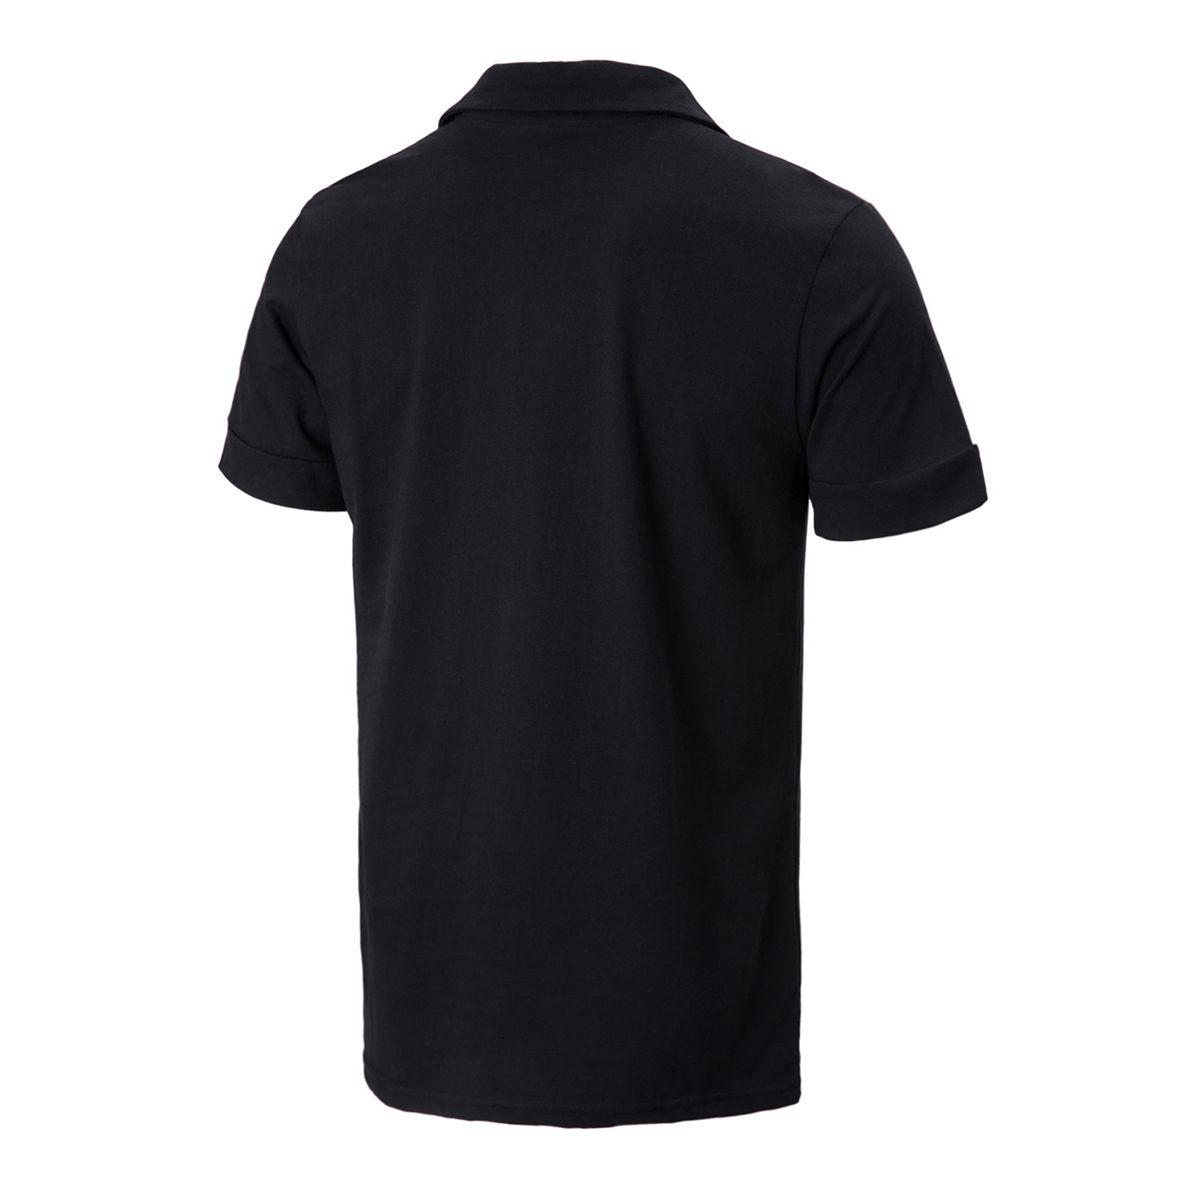 Camiseta Grêmio Retrô Preta Corda Masculina